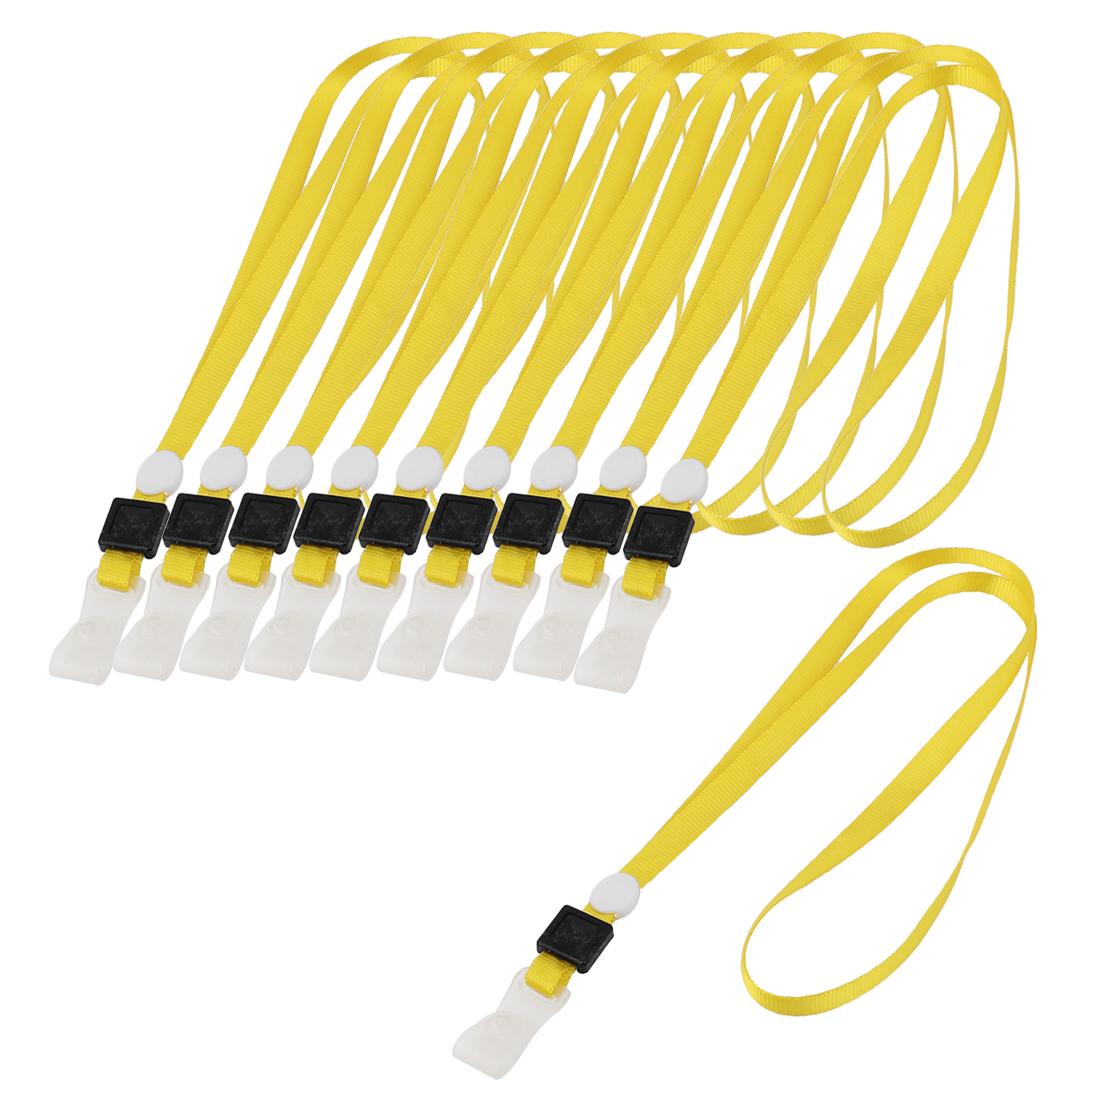 Staff ID Name Card Pass Badge Holder Neck Strap String Lanyard Yellow 10pcs